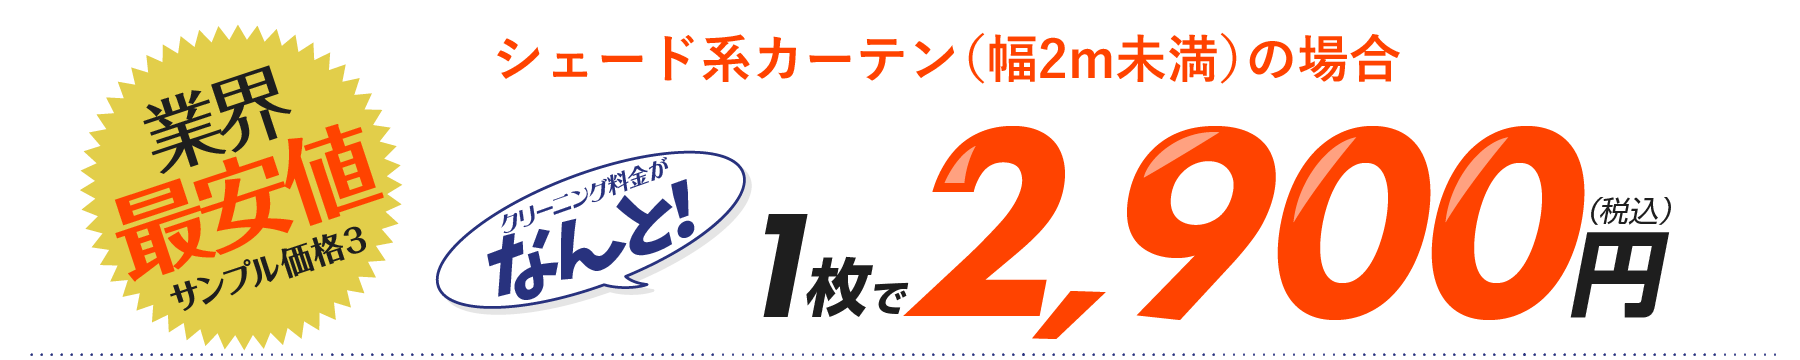 box3-image4